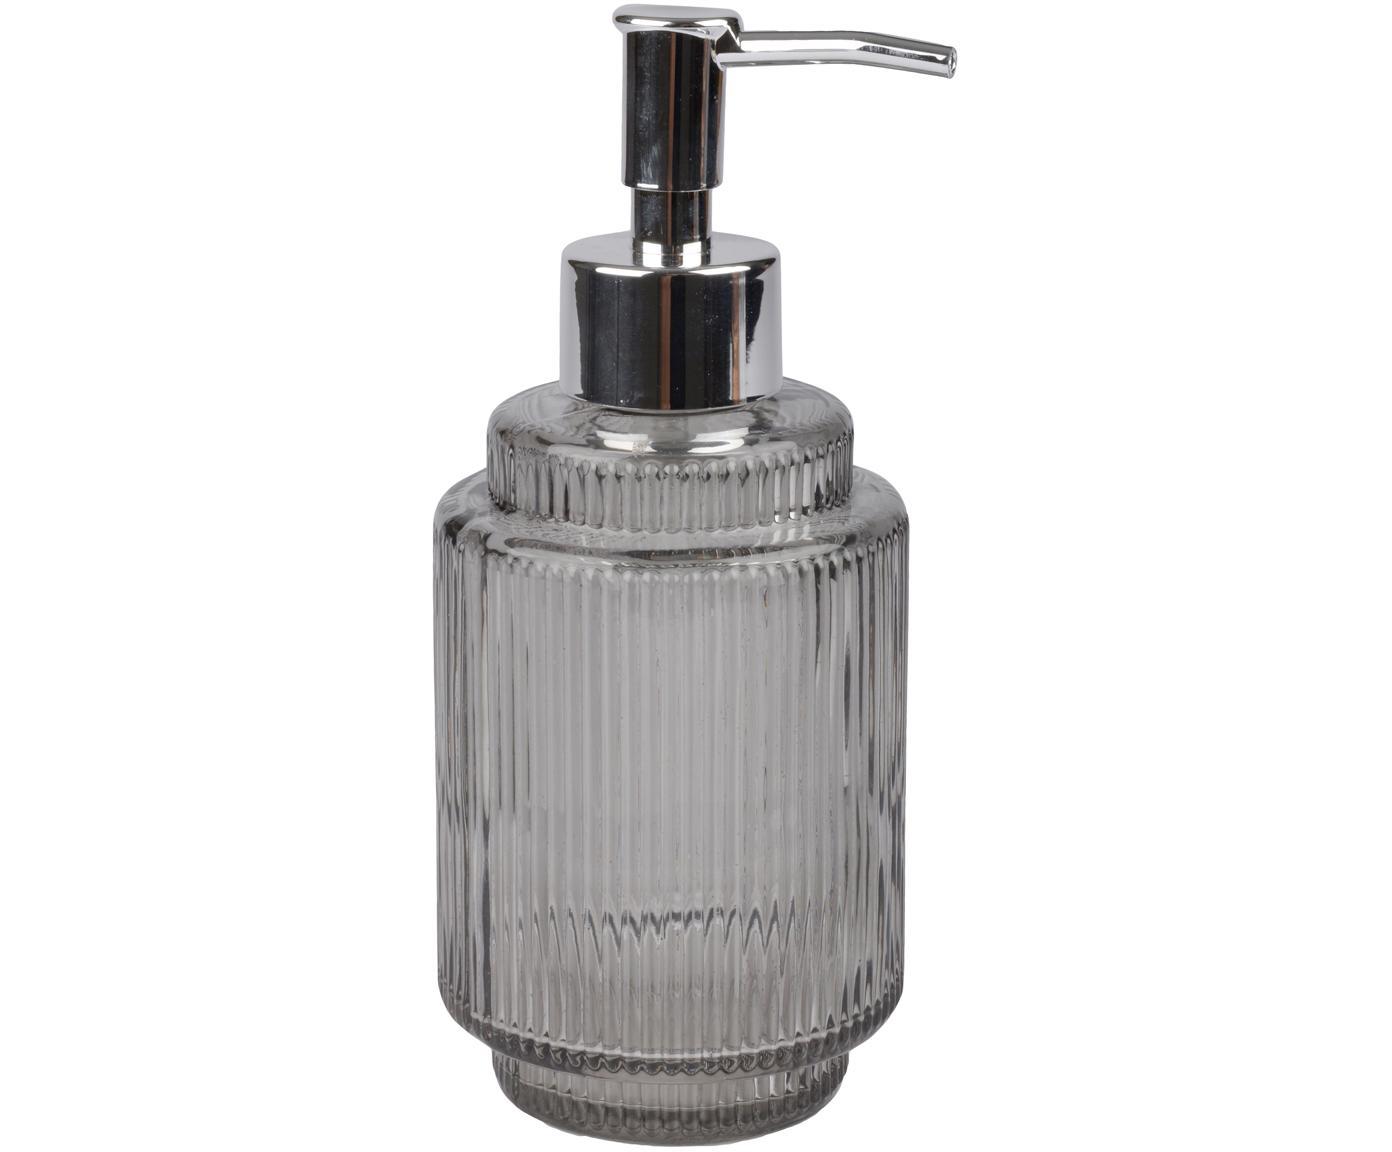 Zeepdispenser Ligia van geribbeld glas, Glas, Grijs, transparant, zilverkleurig, Ø 8 cm